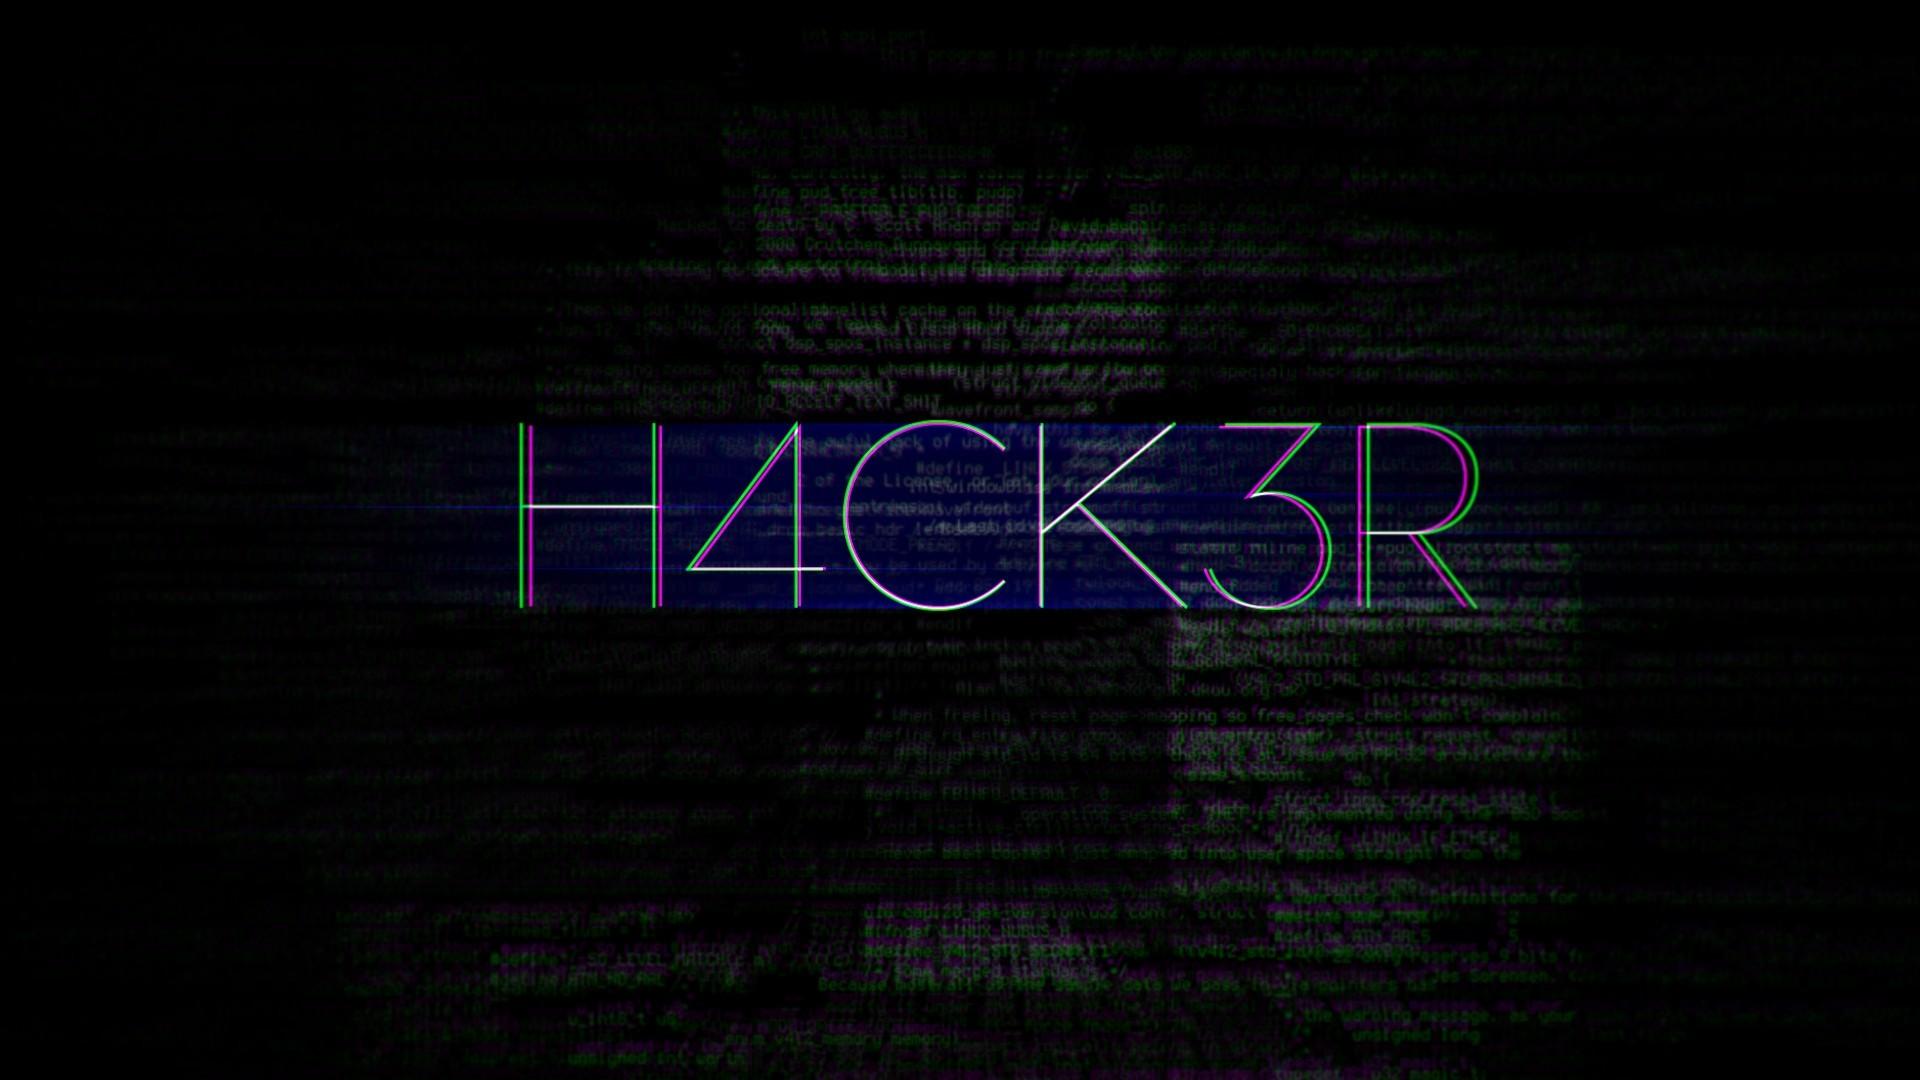 Download Hacker Background Hd 1920X1080 Pics